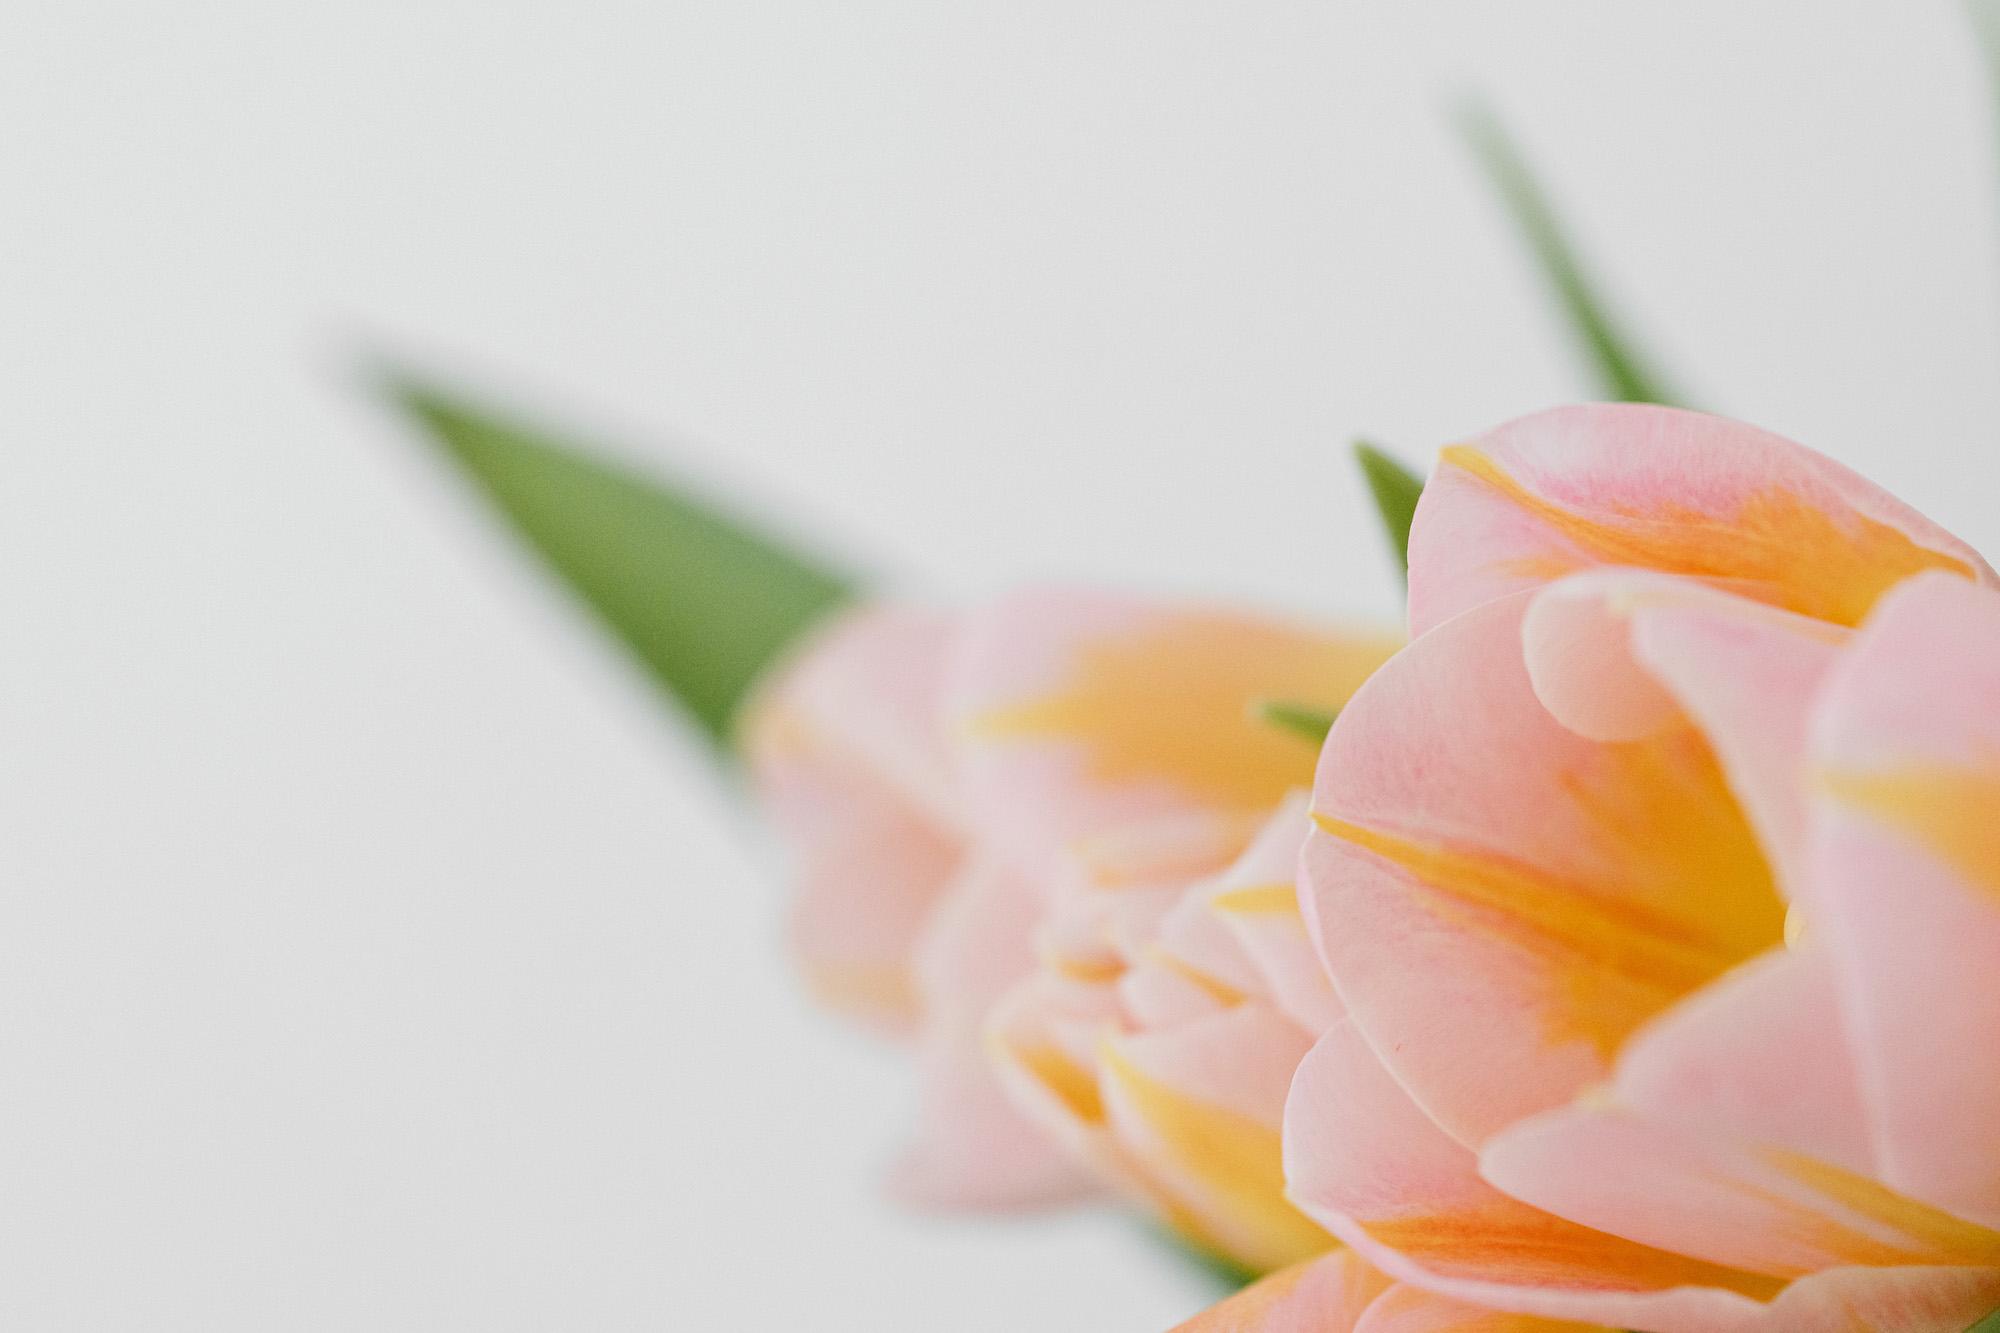 kaboompics_Pink and yellow tulips-3r